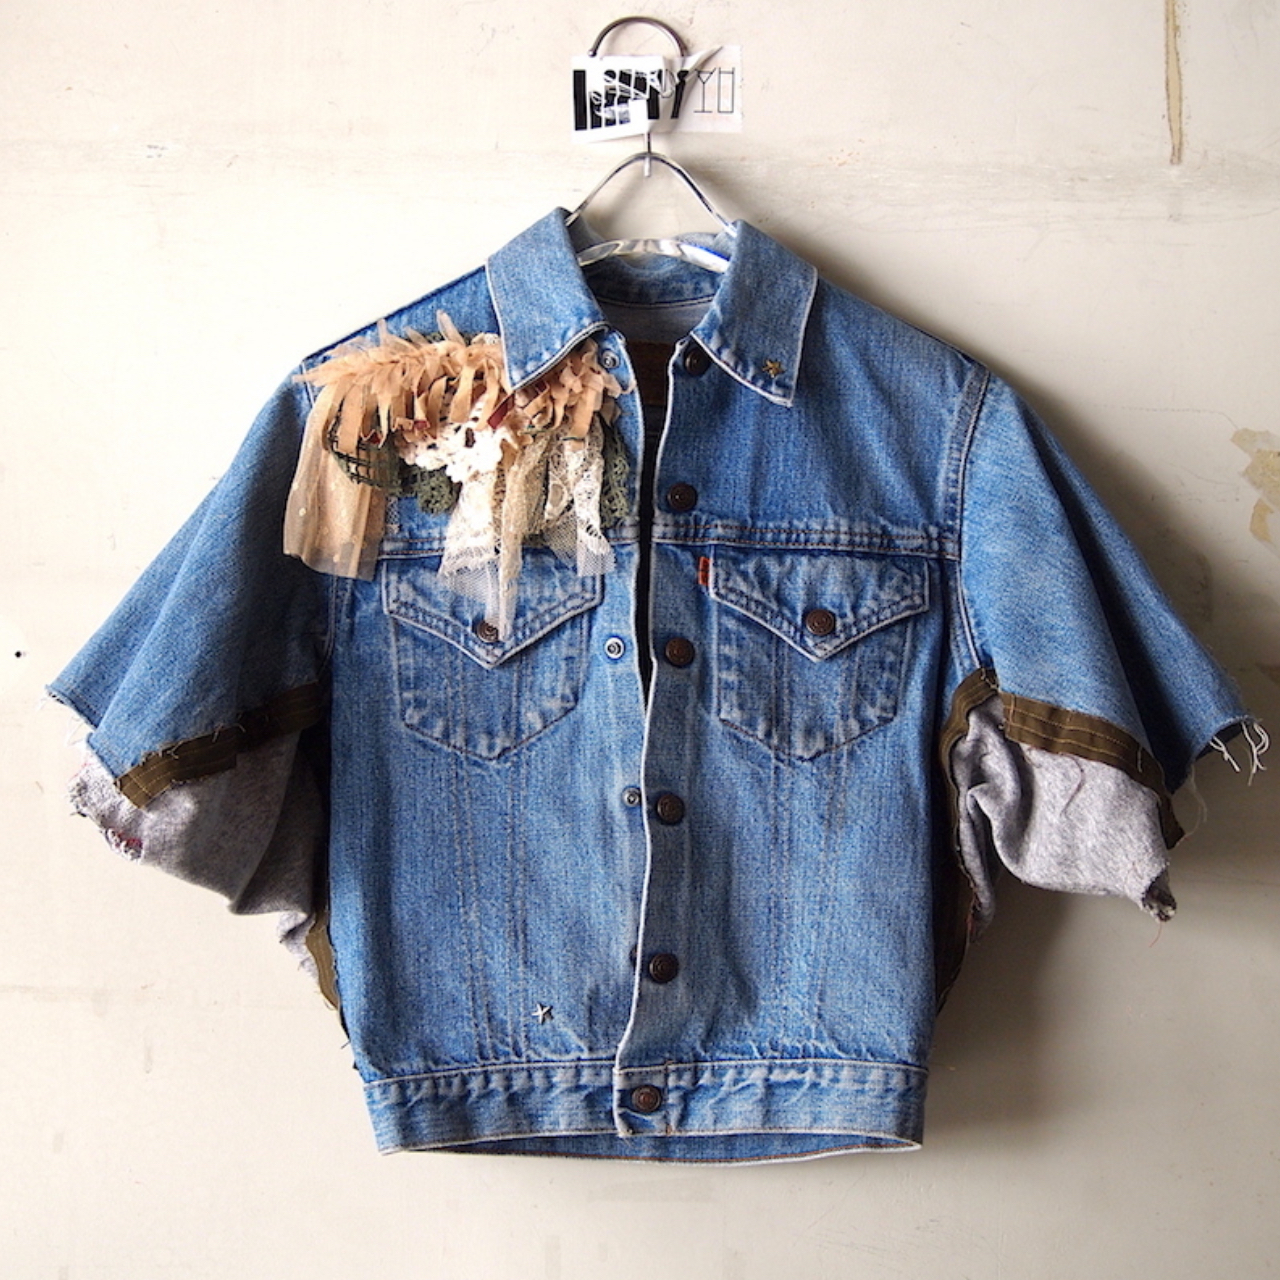 【sandglass】dolman denim short jacket/【サンドグラス】ドルマン デニム ショート ジャケット